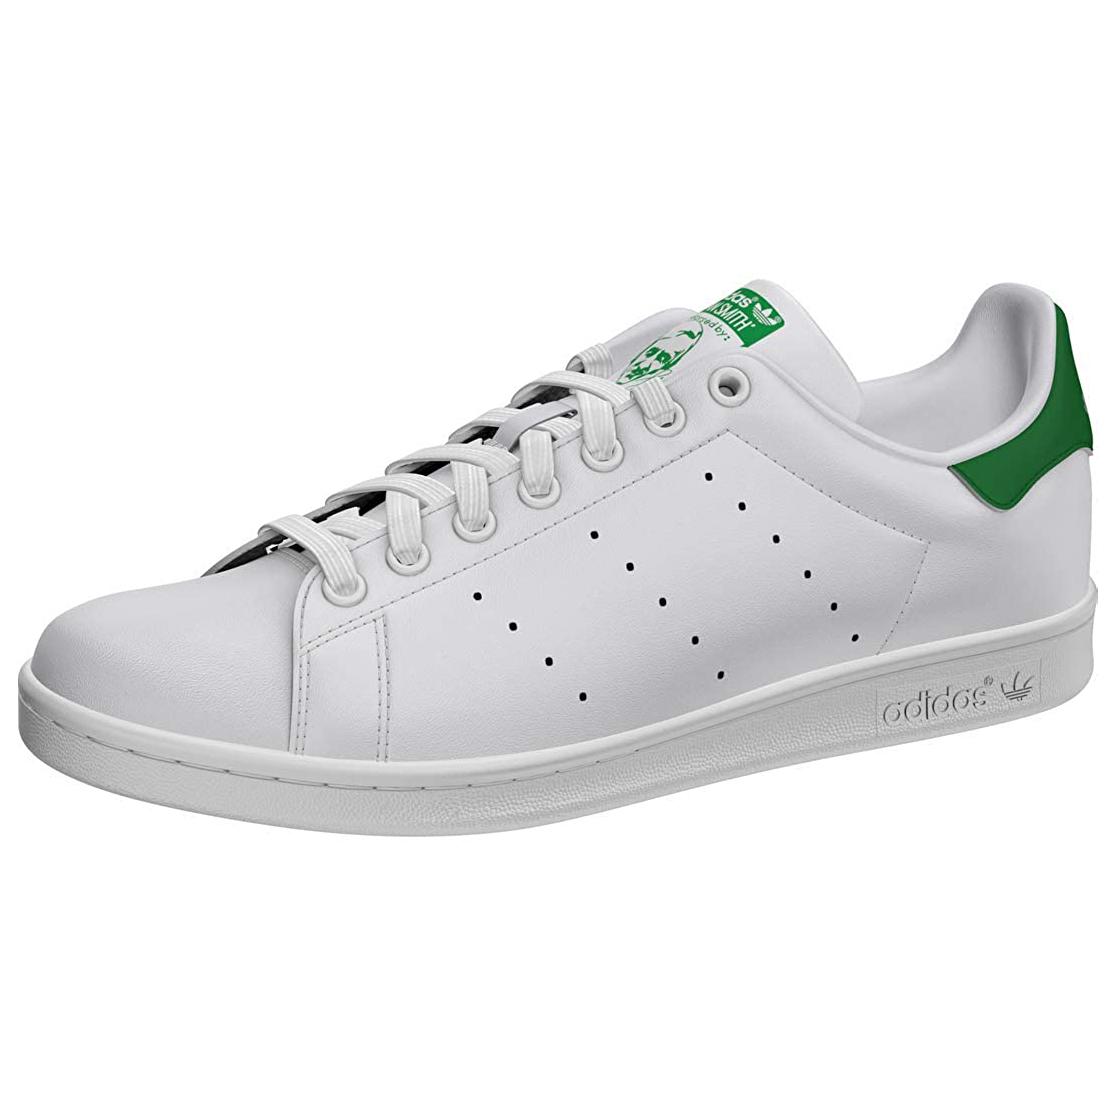 Adidas Stan Smith Men's Tennis Shoes